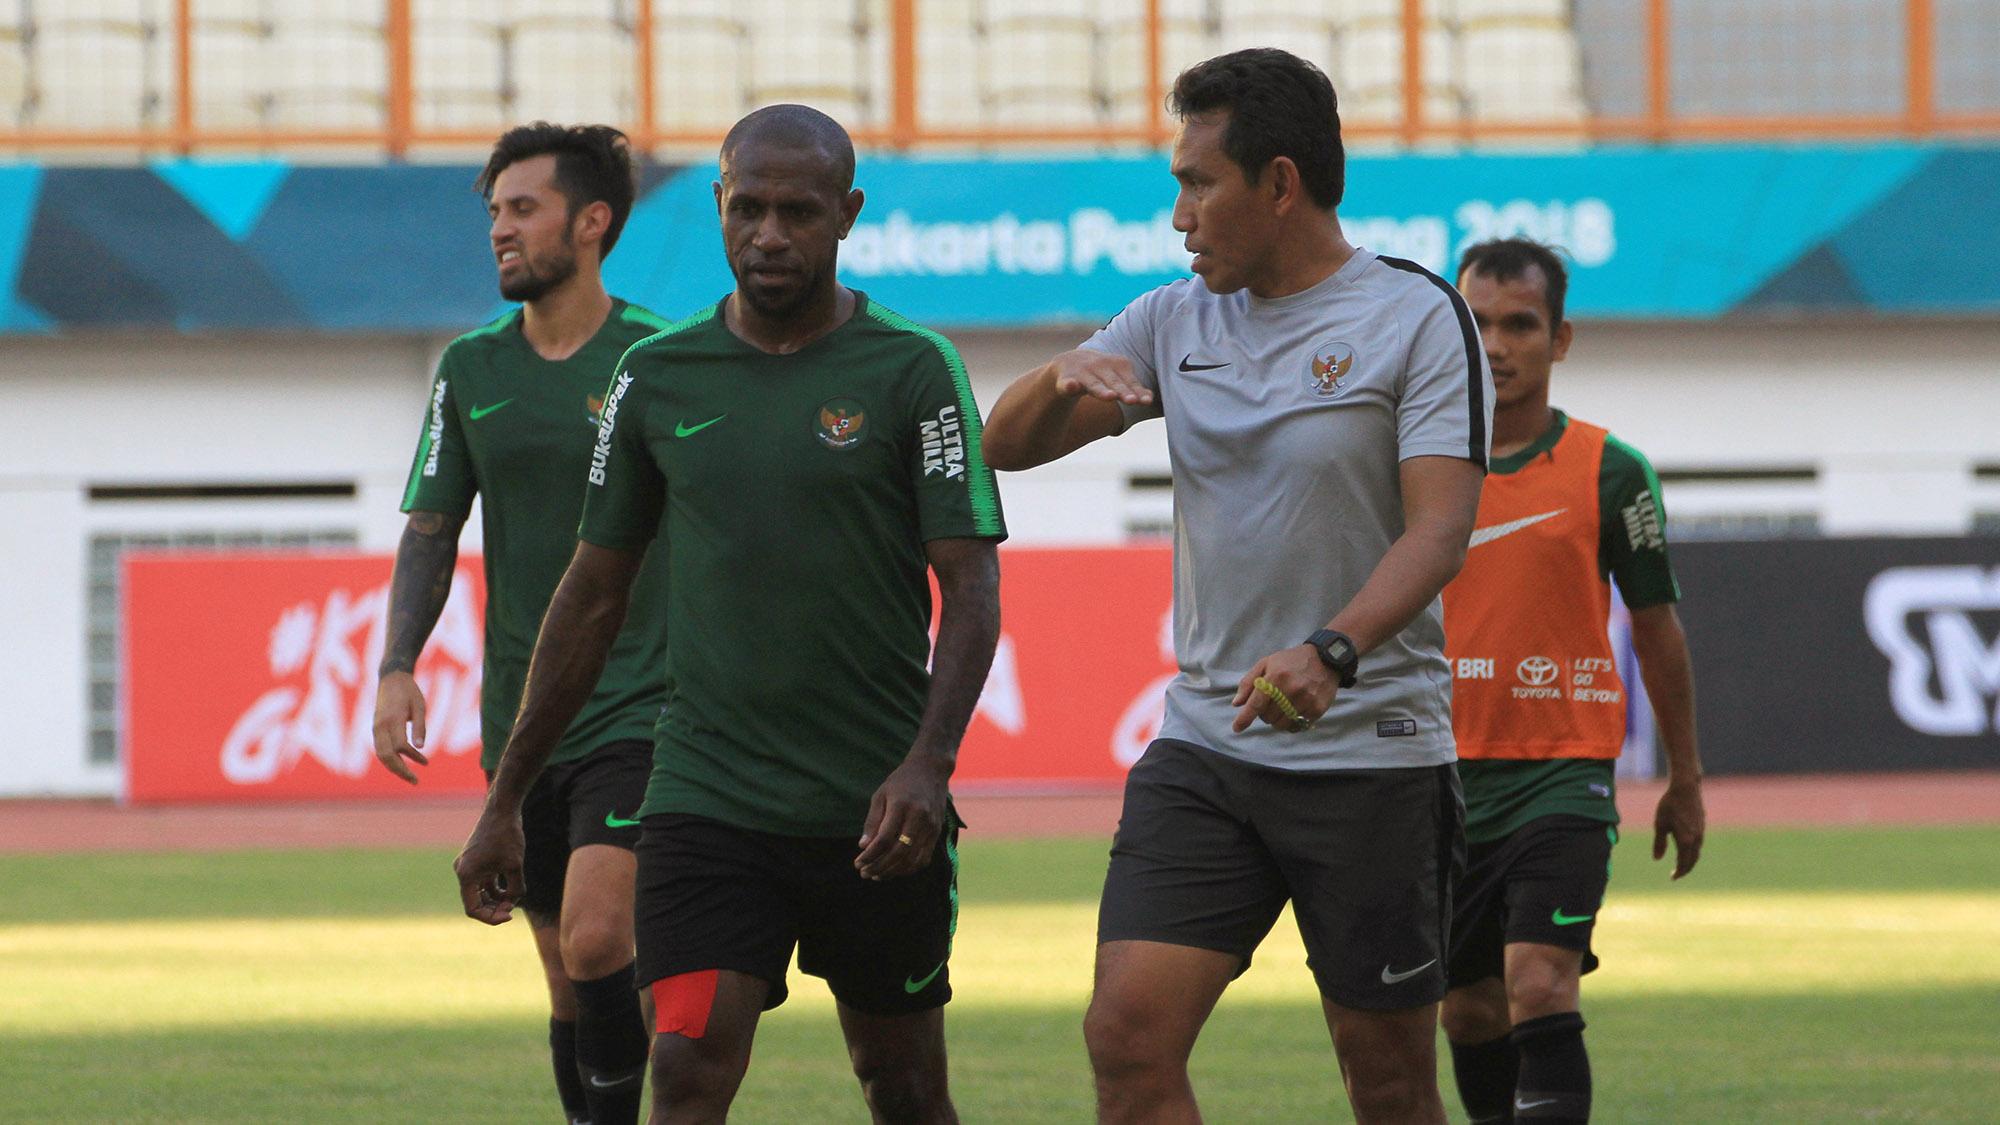 PSSI Pilih Bima Sakti Jadi Manajer Timnas Indonesia di Piala AFF 2018